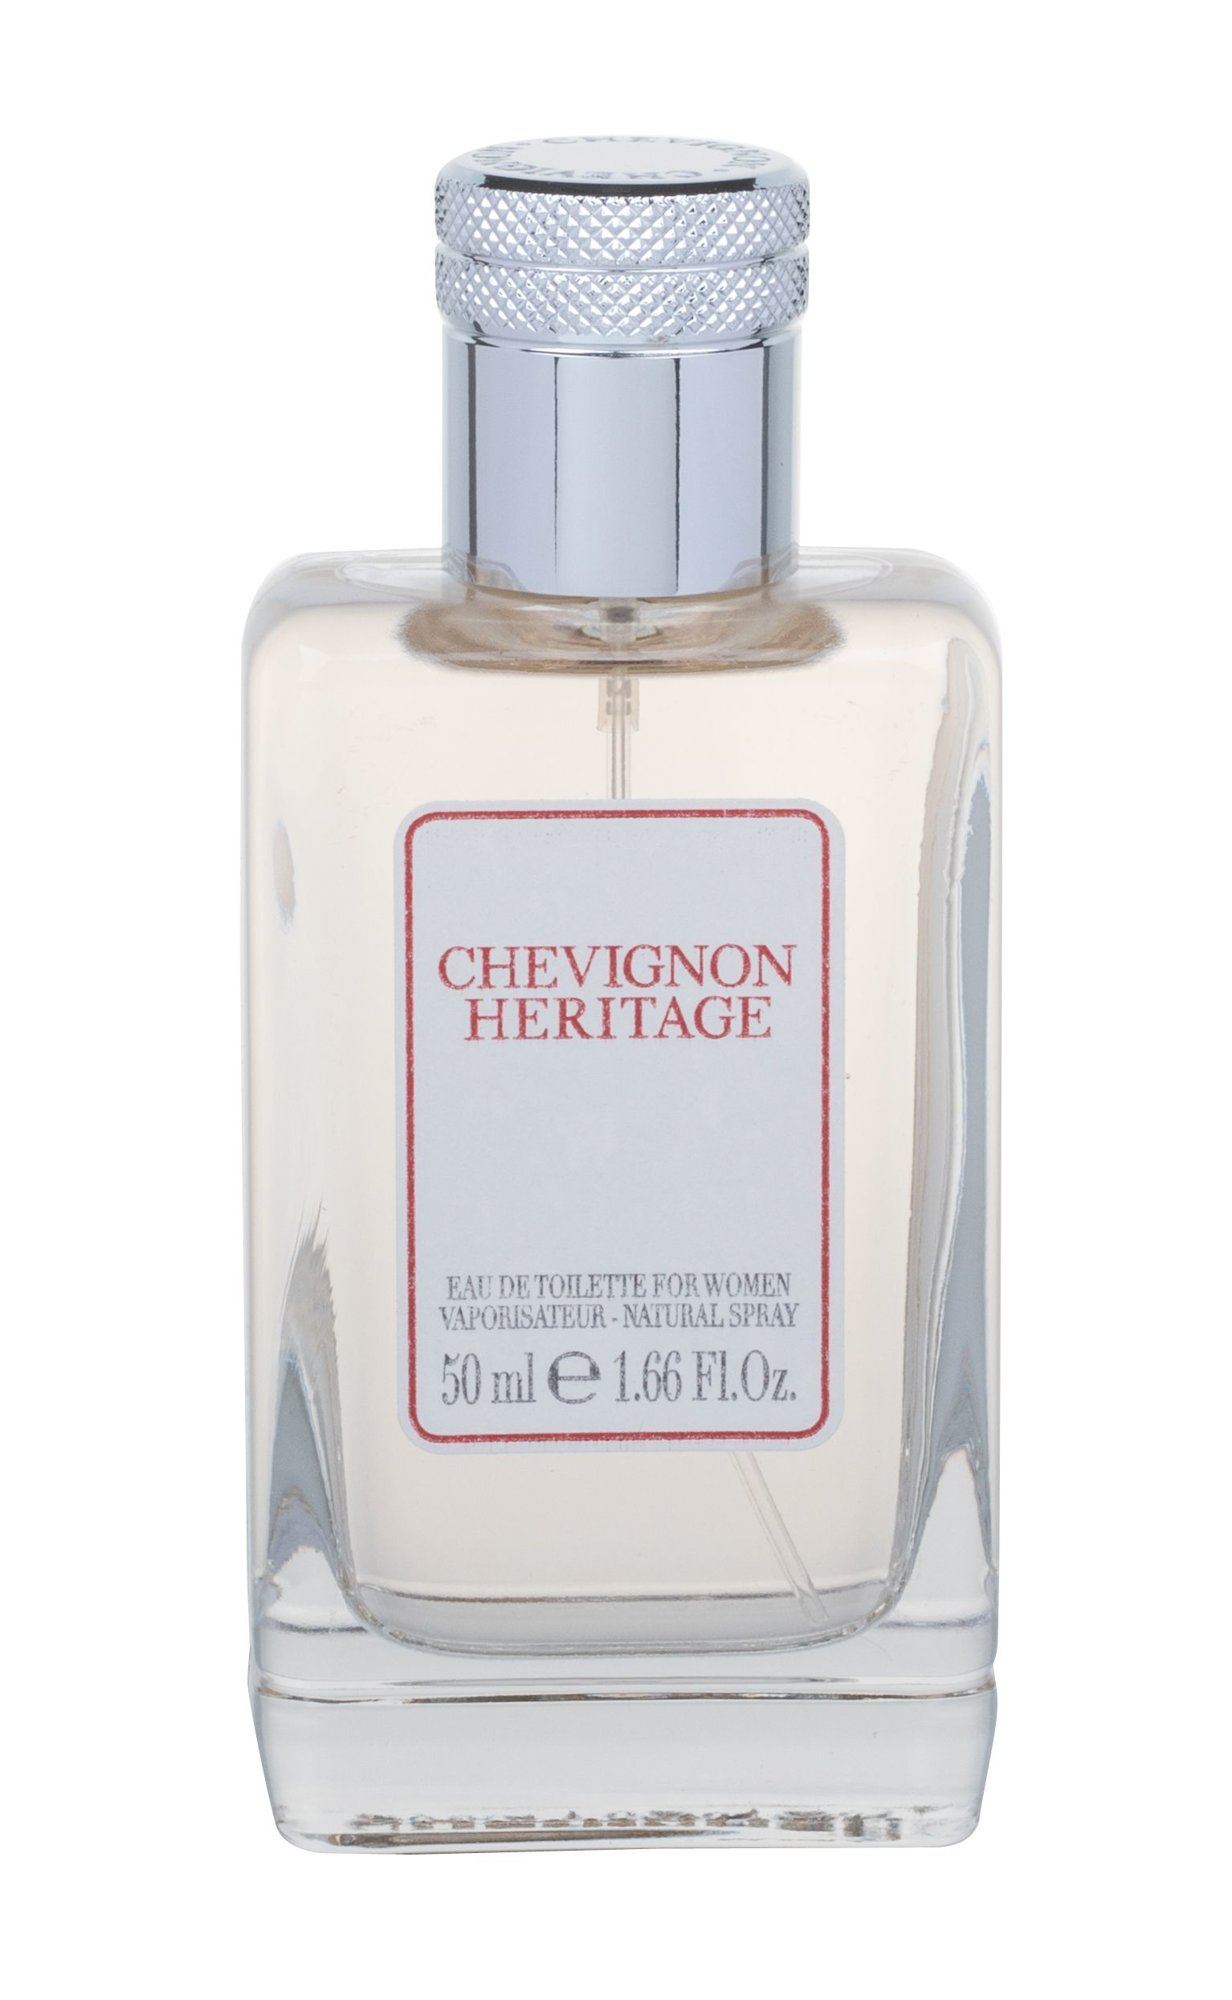 Chevignon Heritage Eau de Toilette 50ml